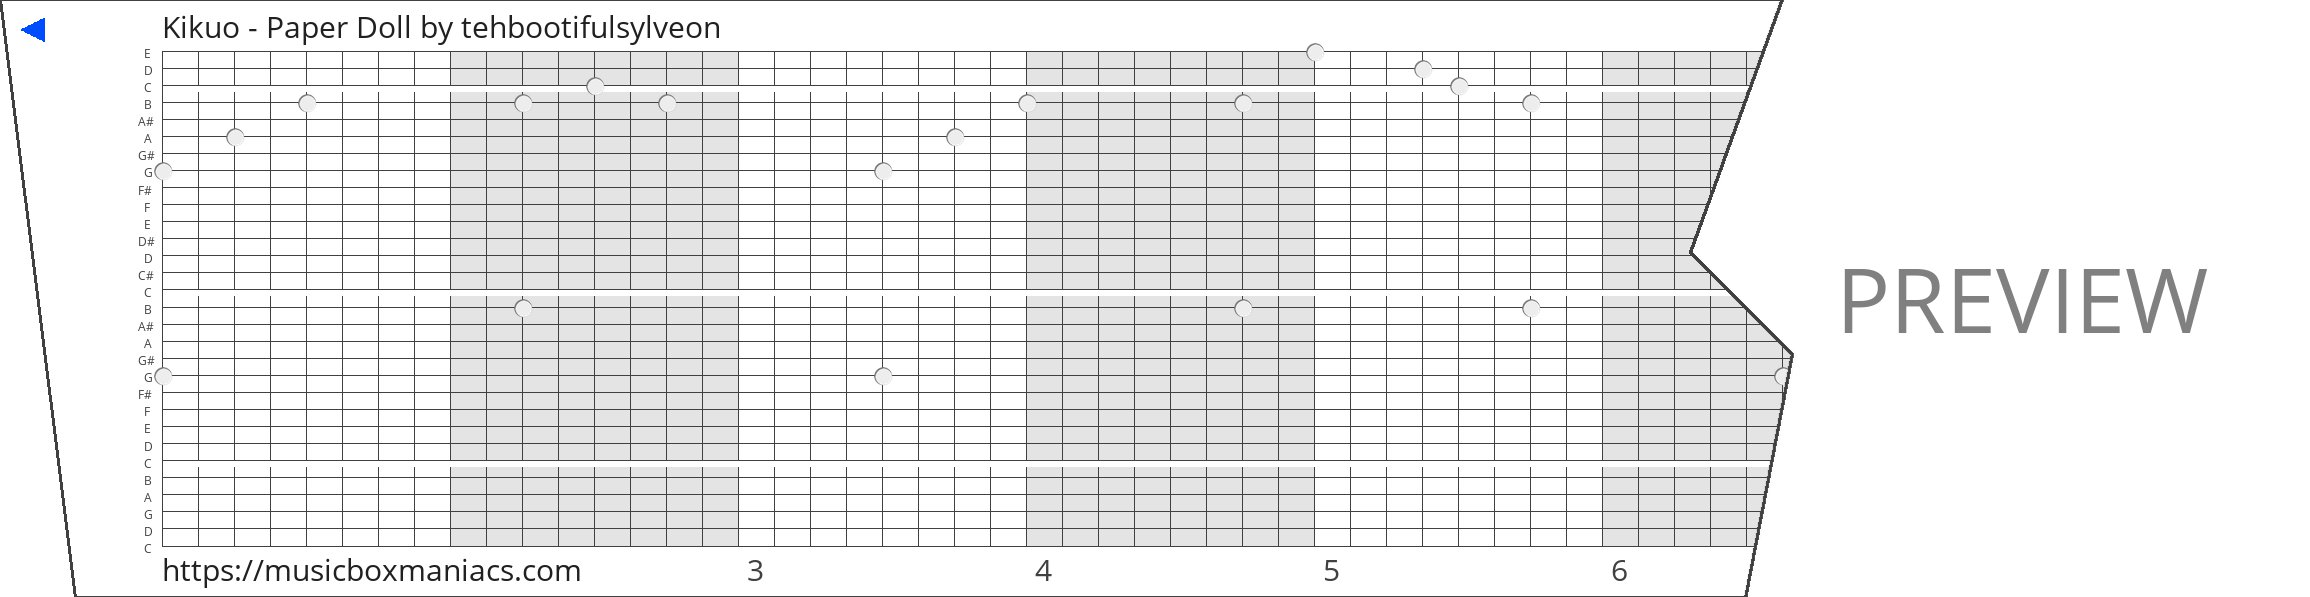 Kikuo - Paper Doll 30 note music box paper strip